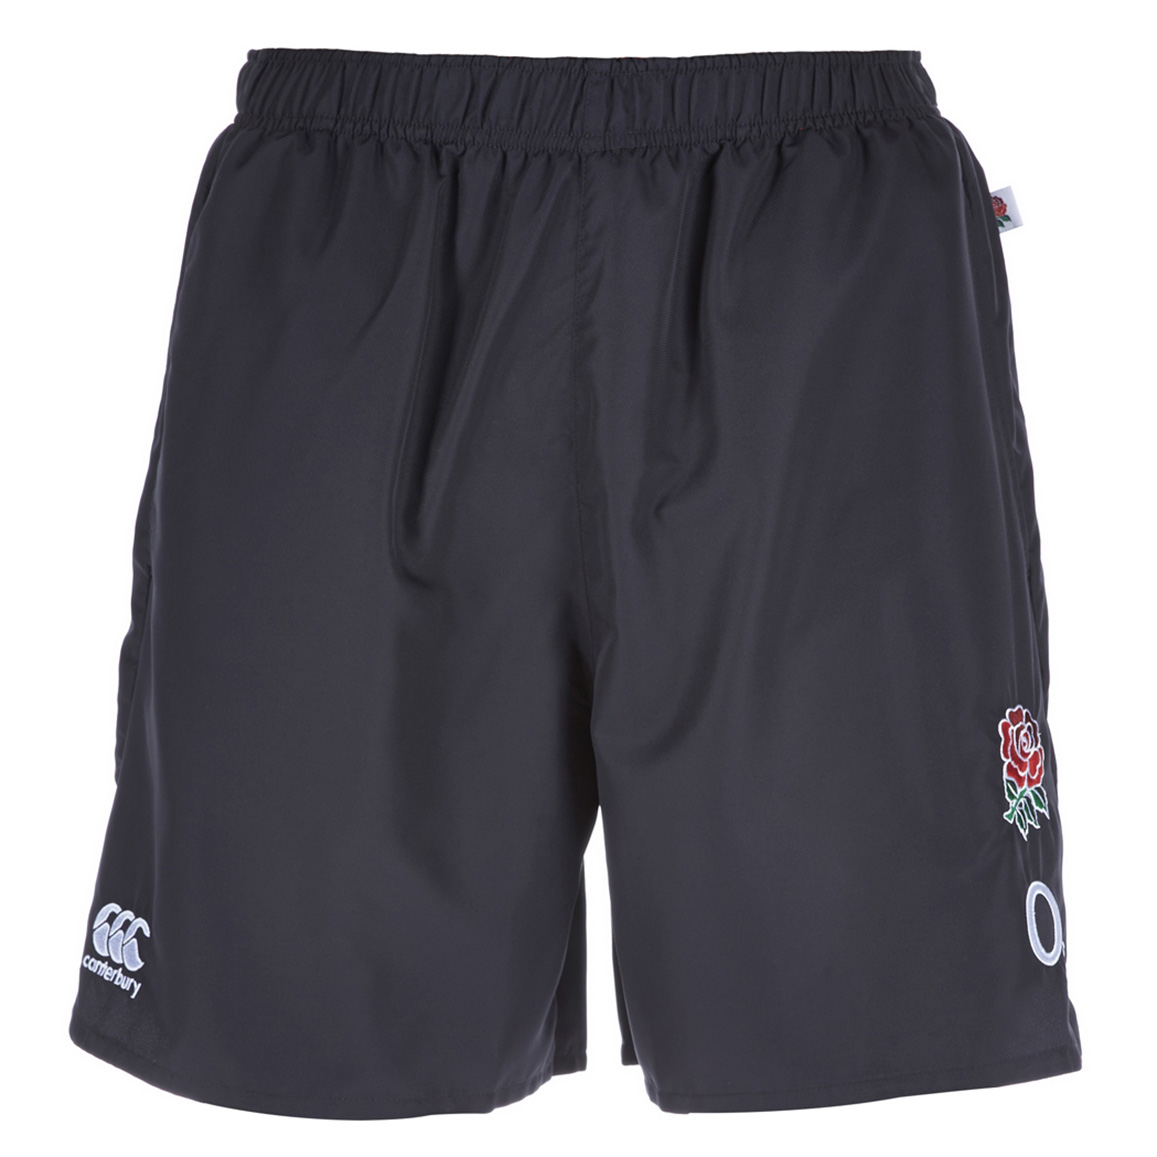 England Gym Short Navy